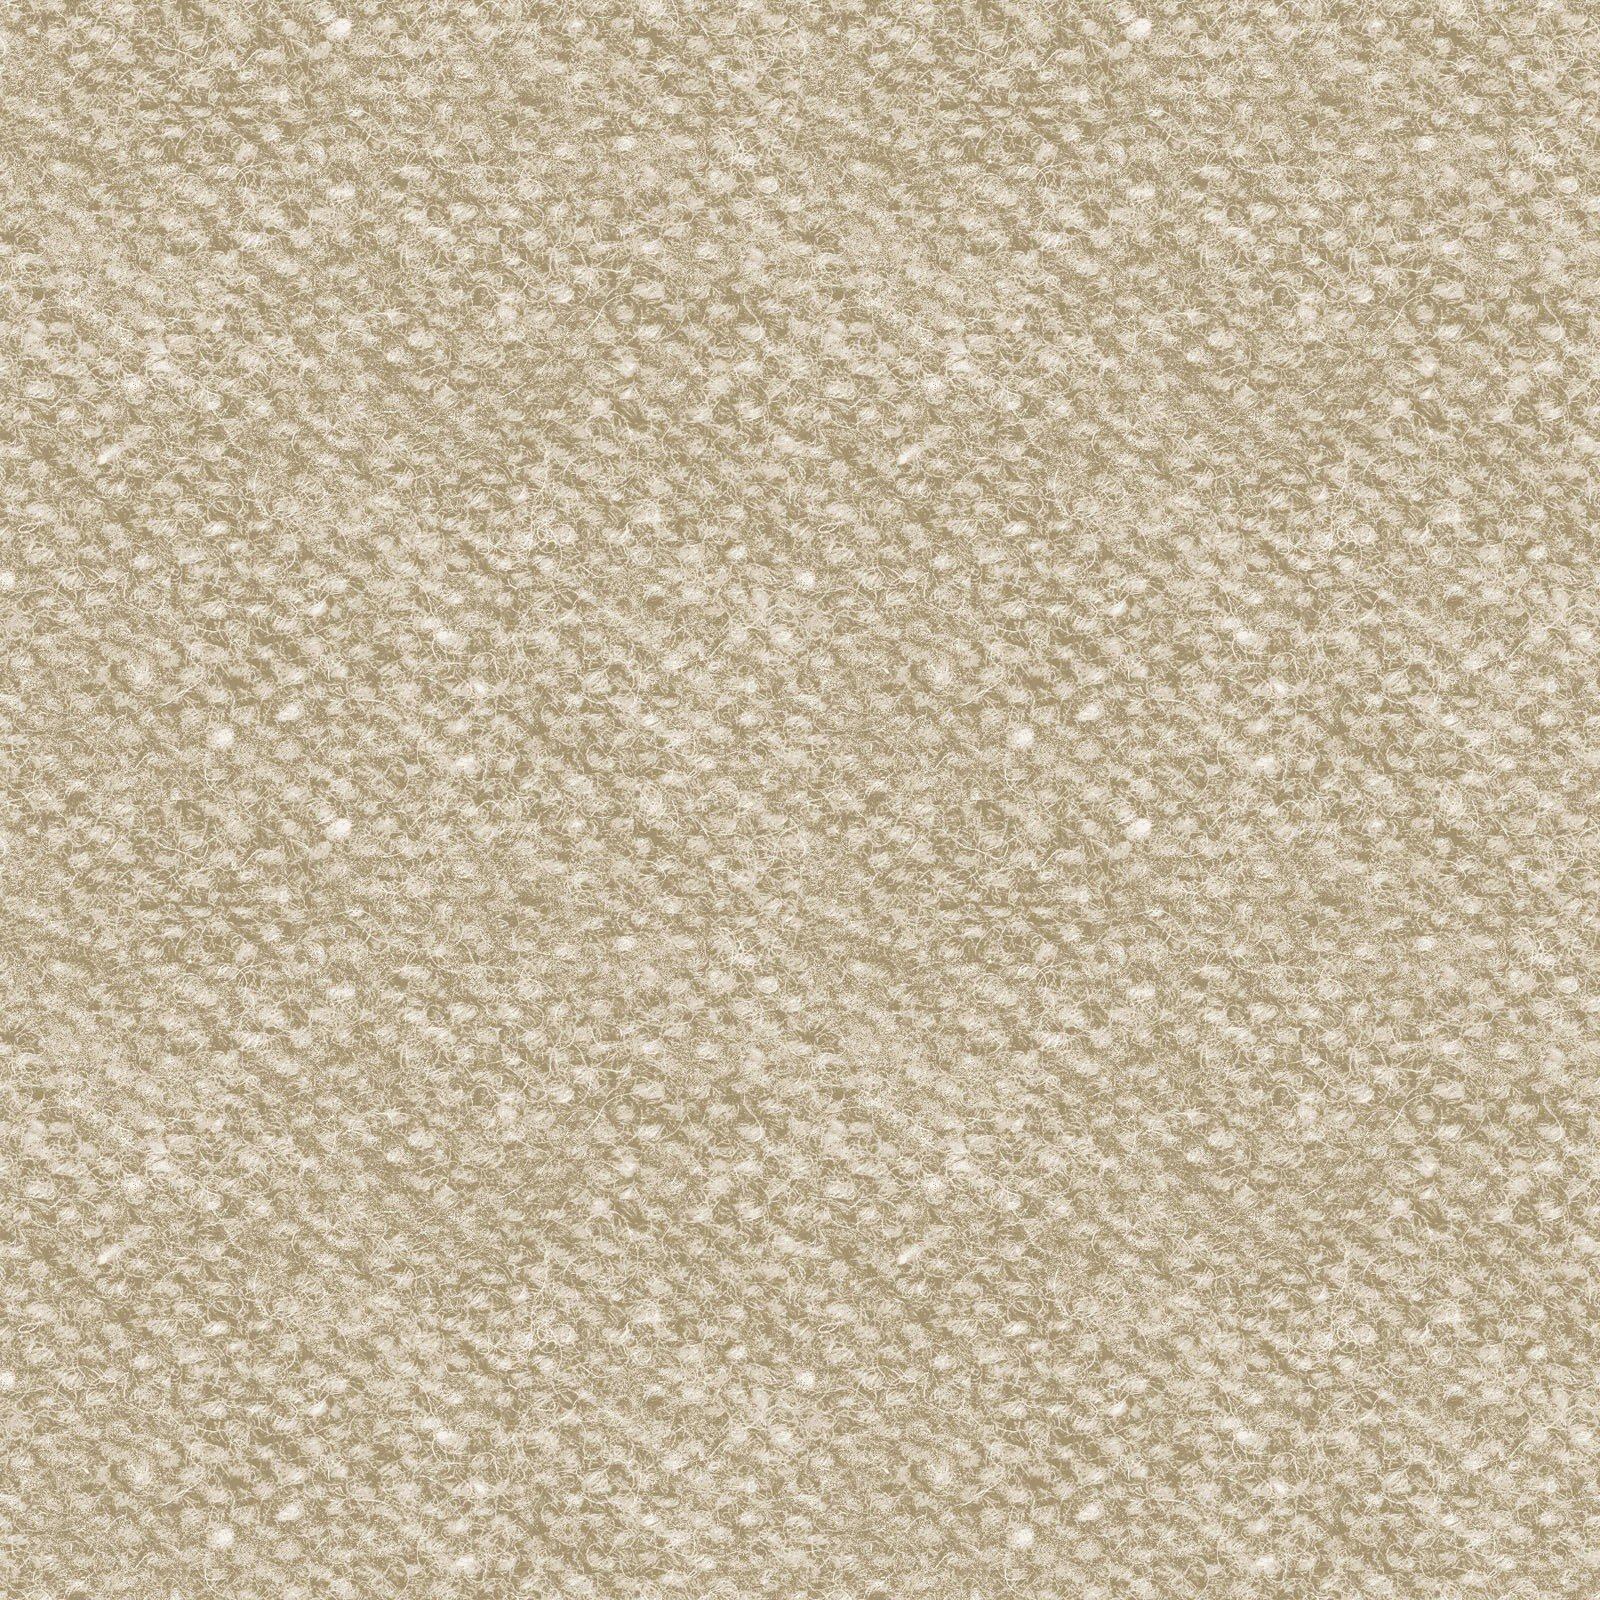 Woolies Flannel Nubby Tweed Ecru (MASF18507-E)